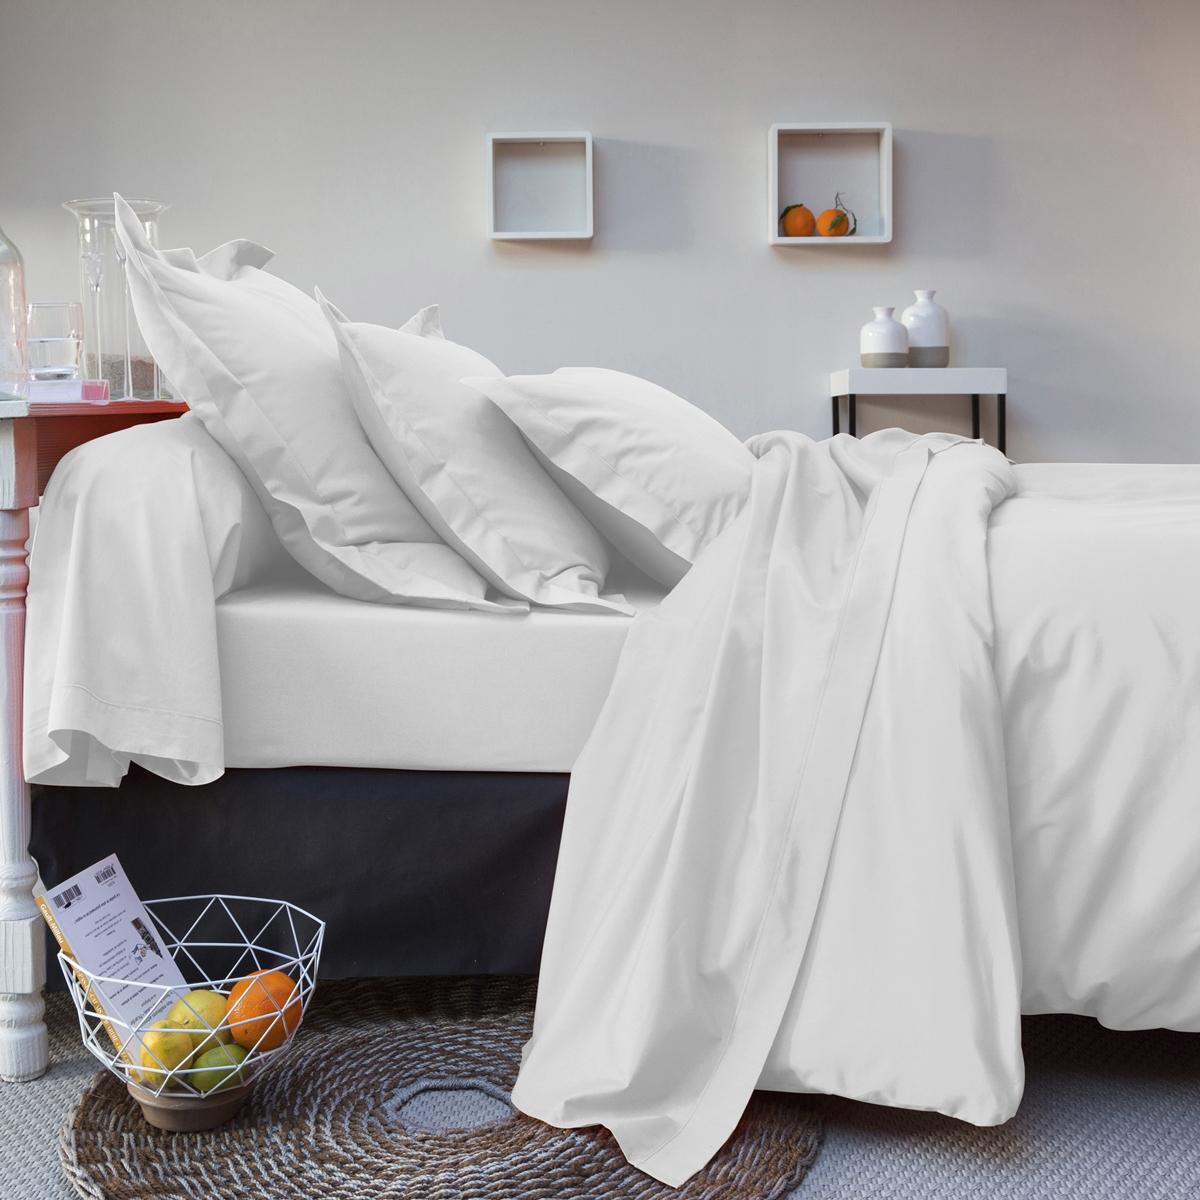 White Duvet Cover 100% Cotton